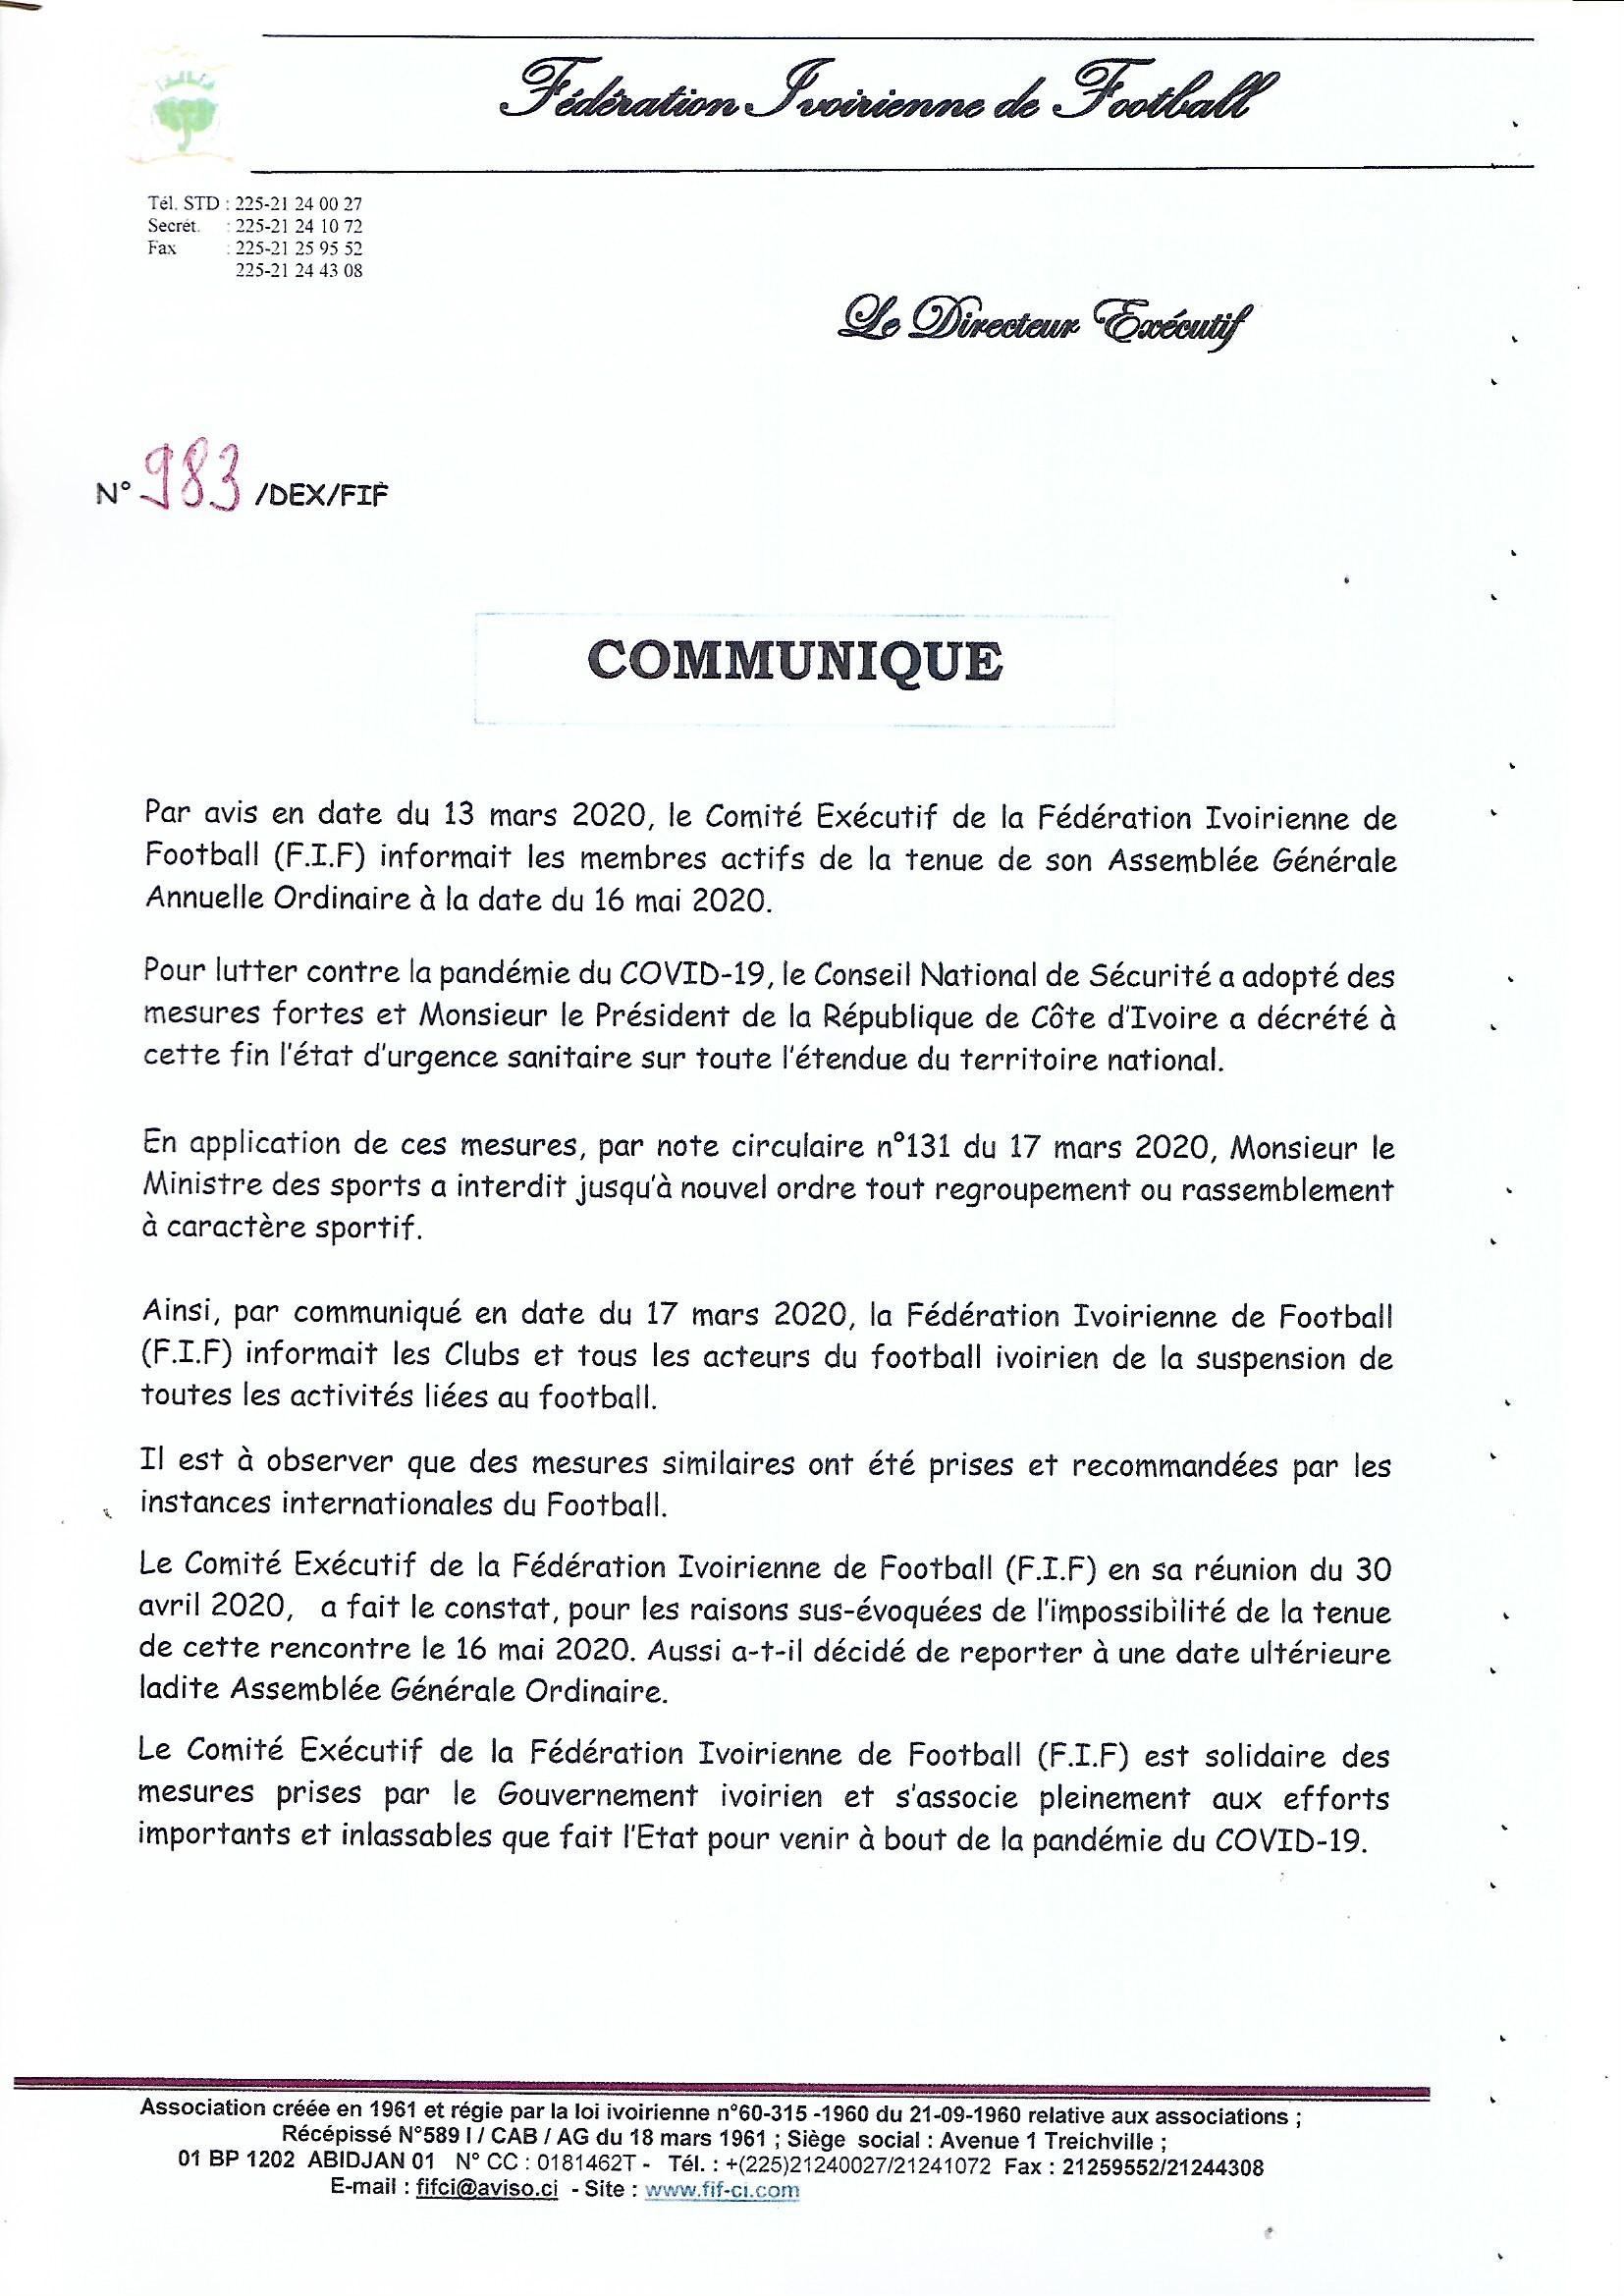 fif-lassemblee-generale-ordinaire-reportee